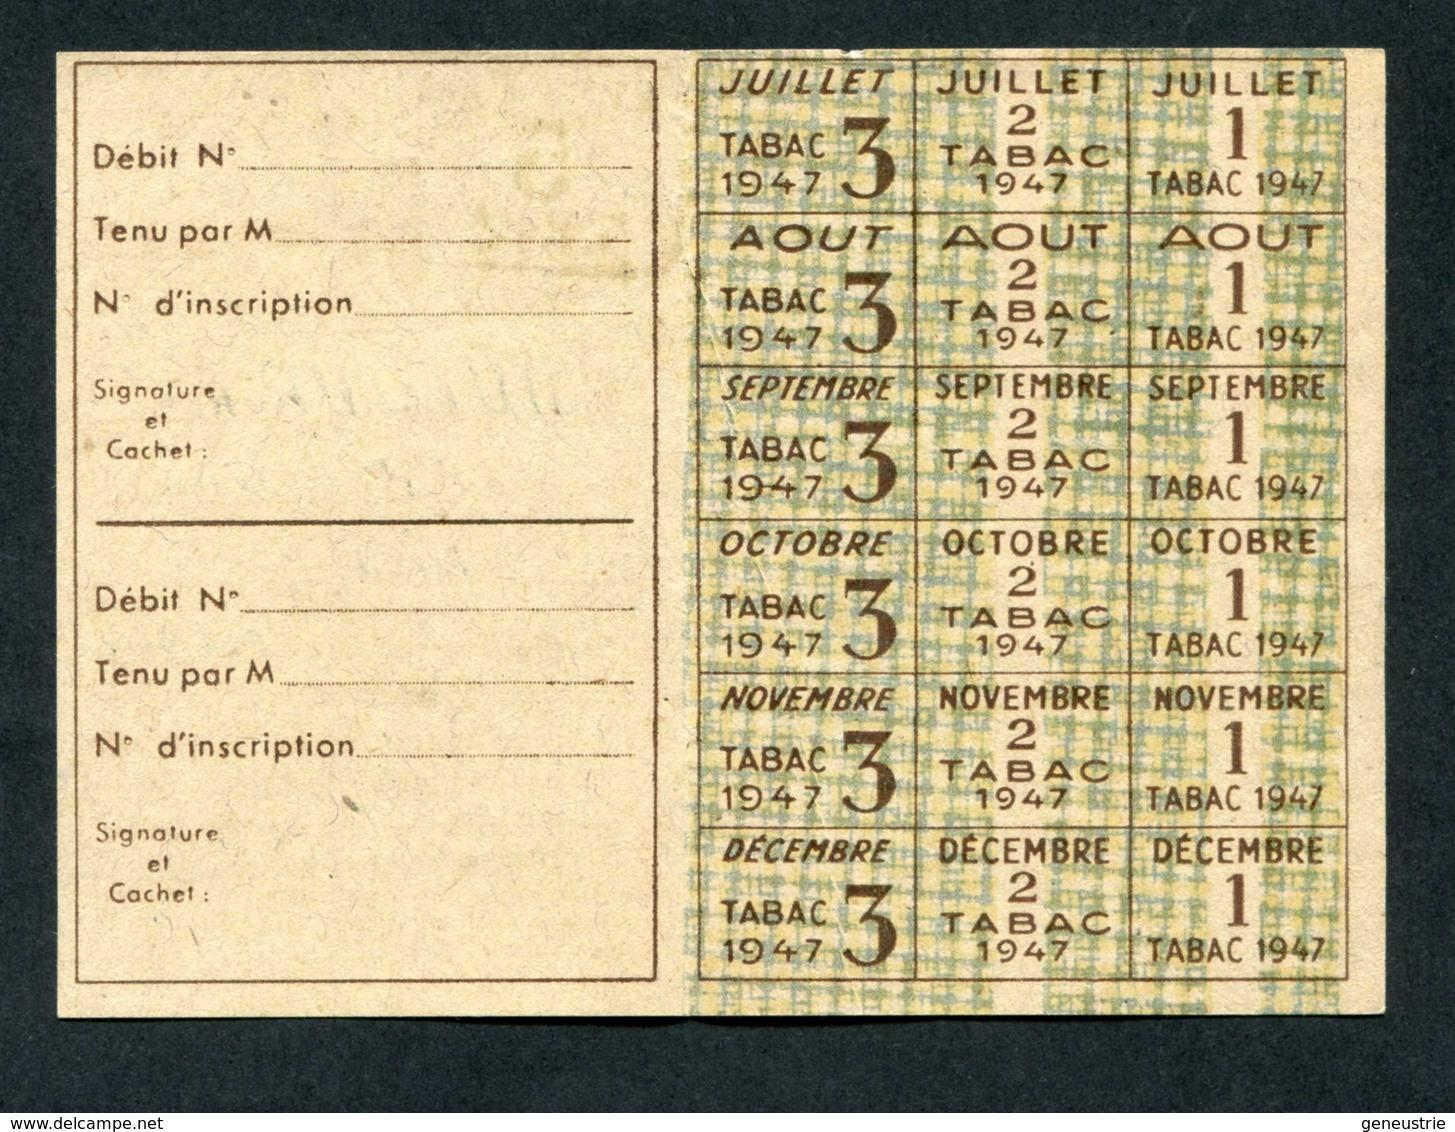 "WWII Carte D'alimentation - Carte De Tabac - Ticket De Rationnement - Nice - Alpes-Maritimes 1947"" WW2 - Documents"